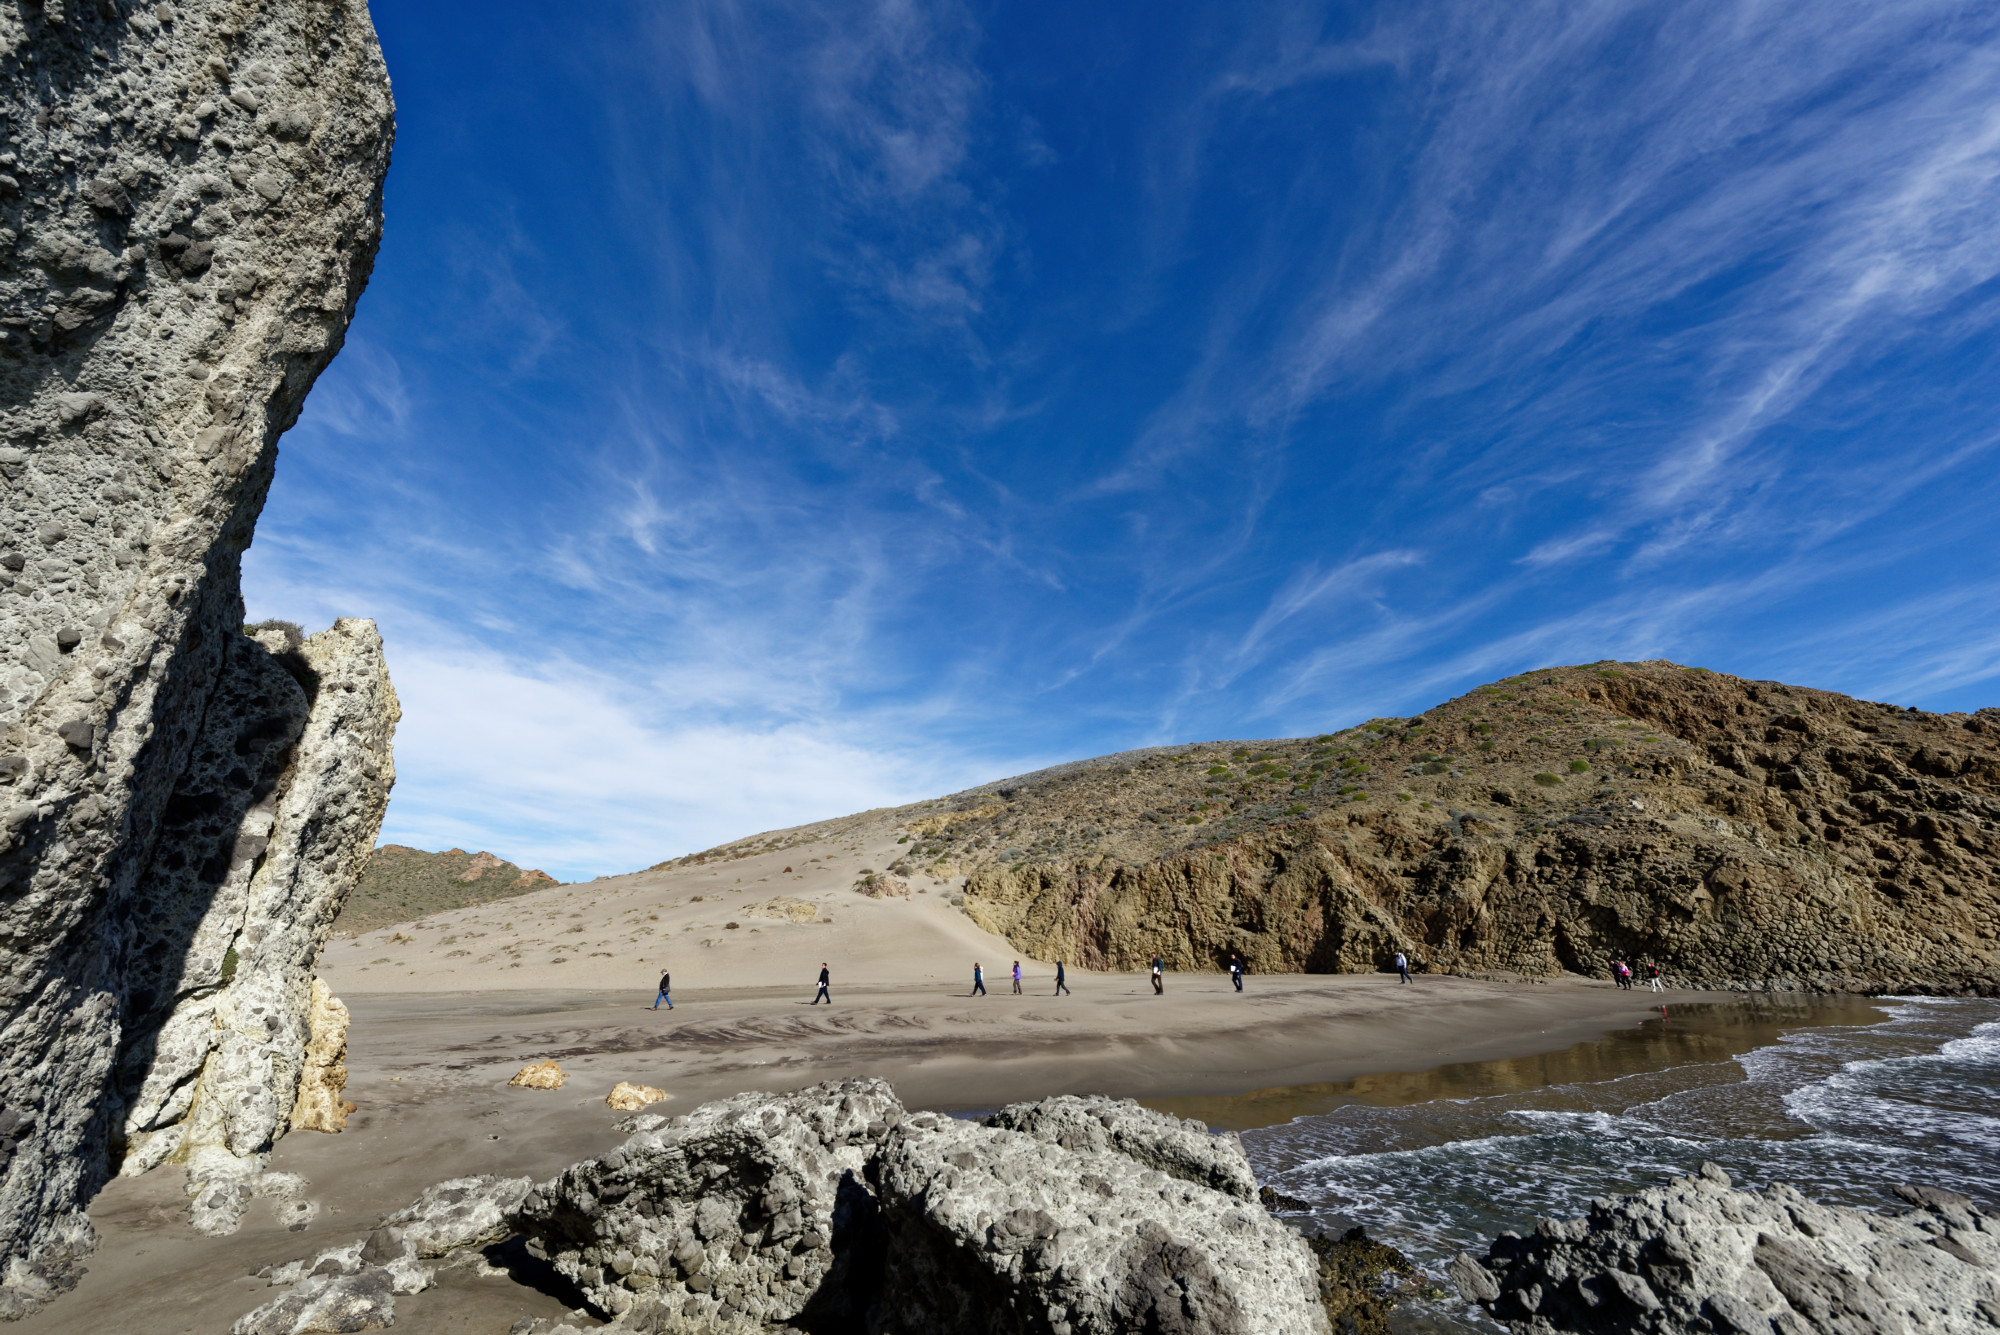 171214-San Jose-Playa del Monsul (Cabo de Gata-Andalousie) (181)